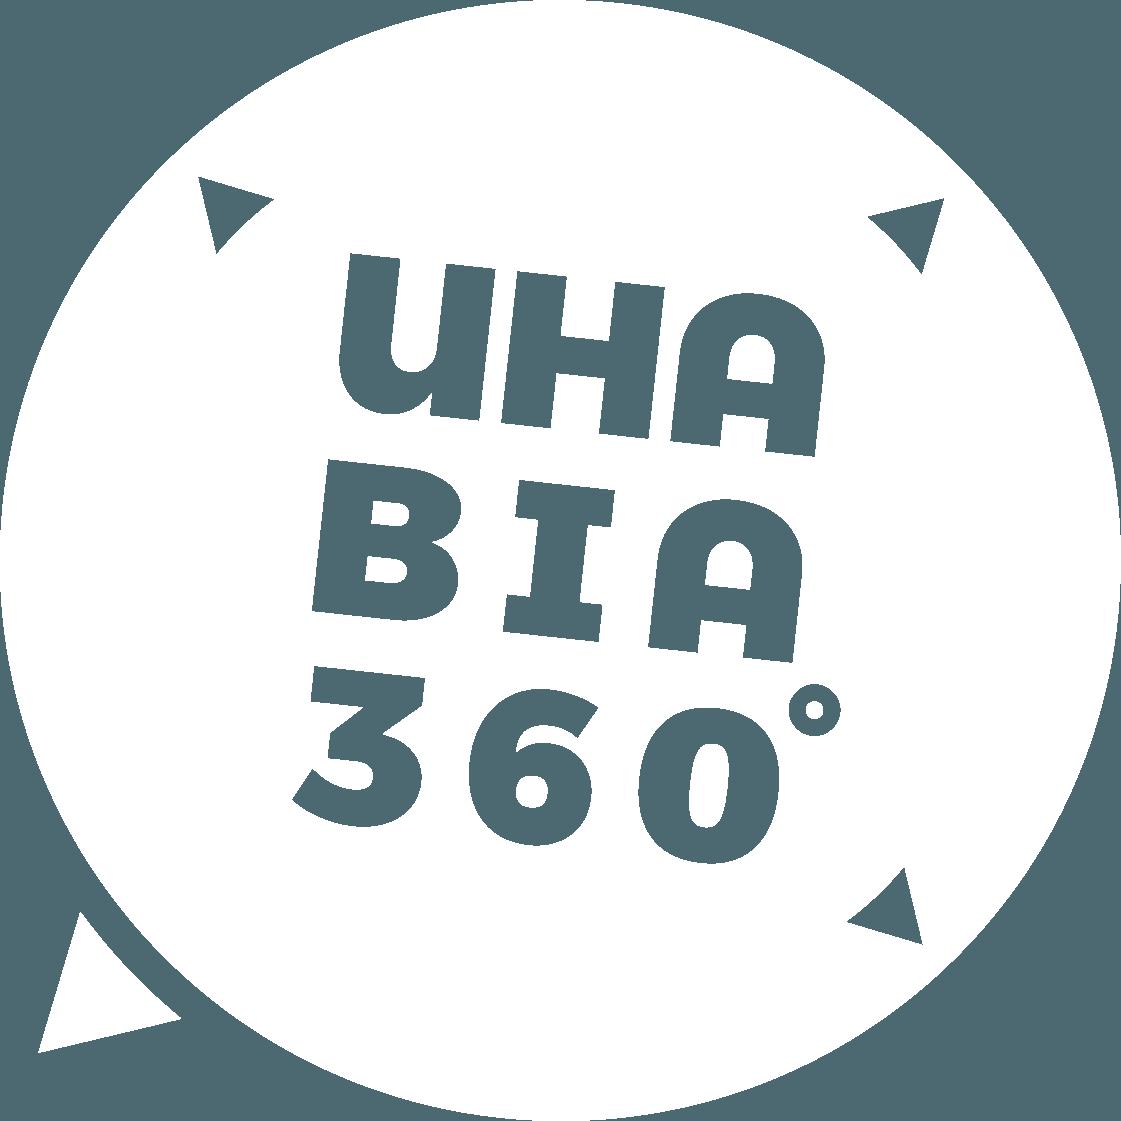 Uhabia360°